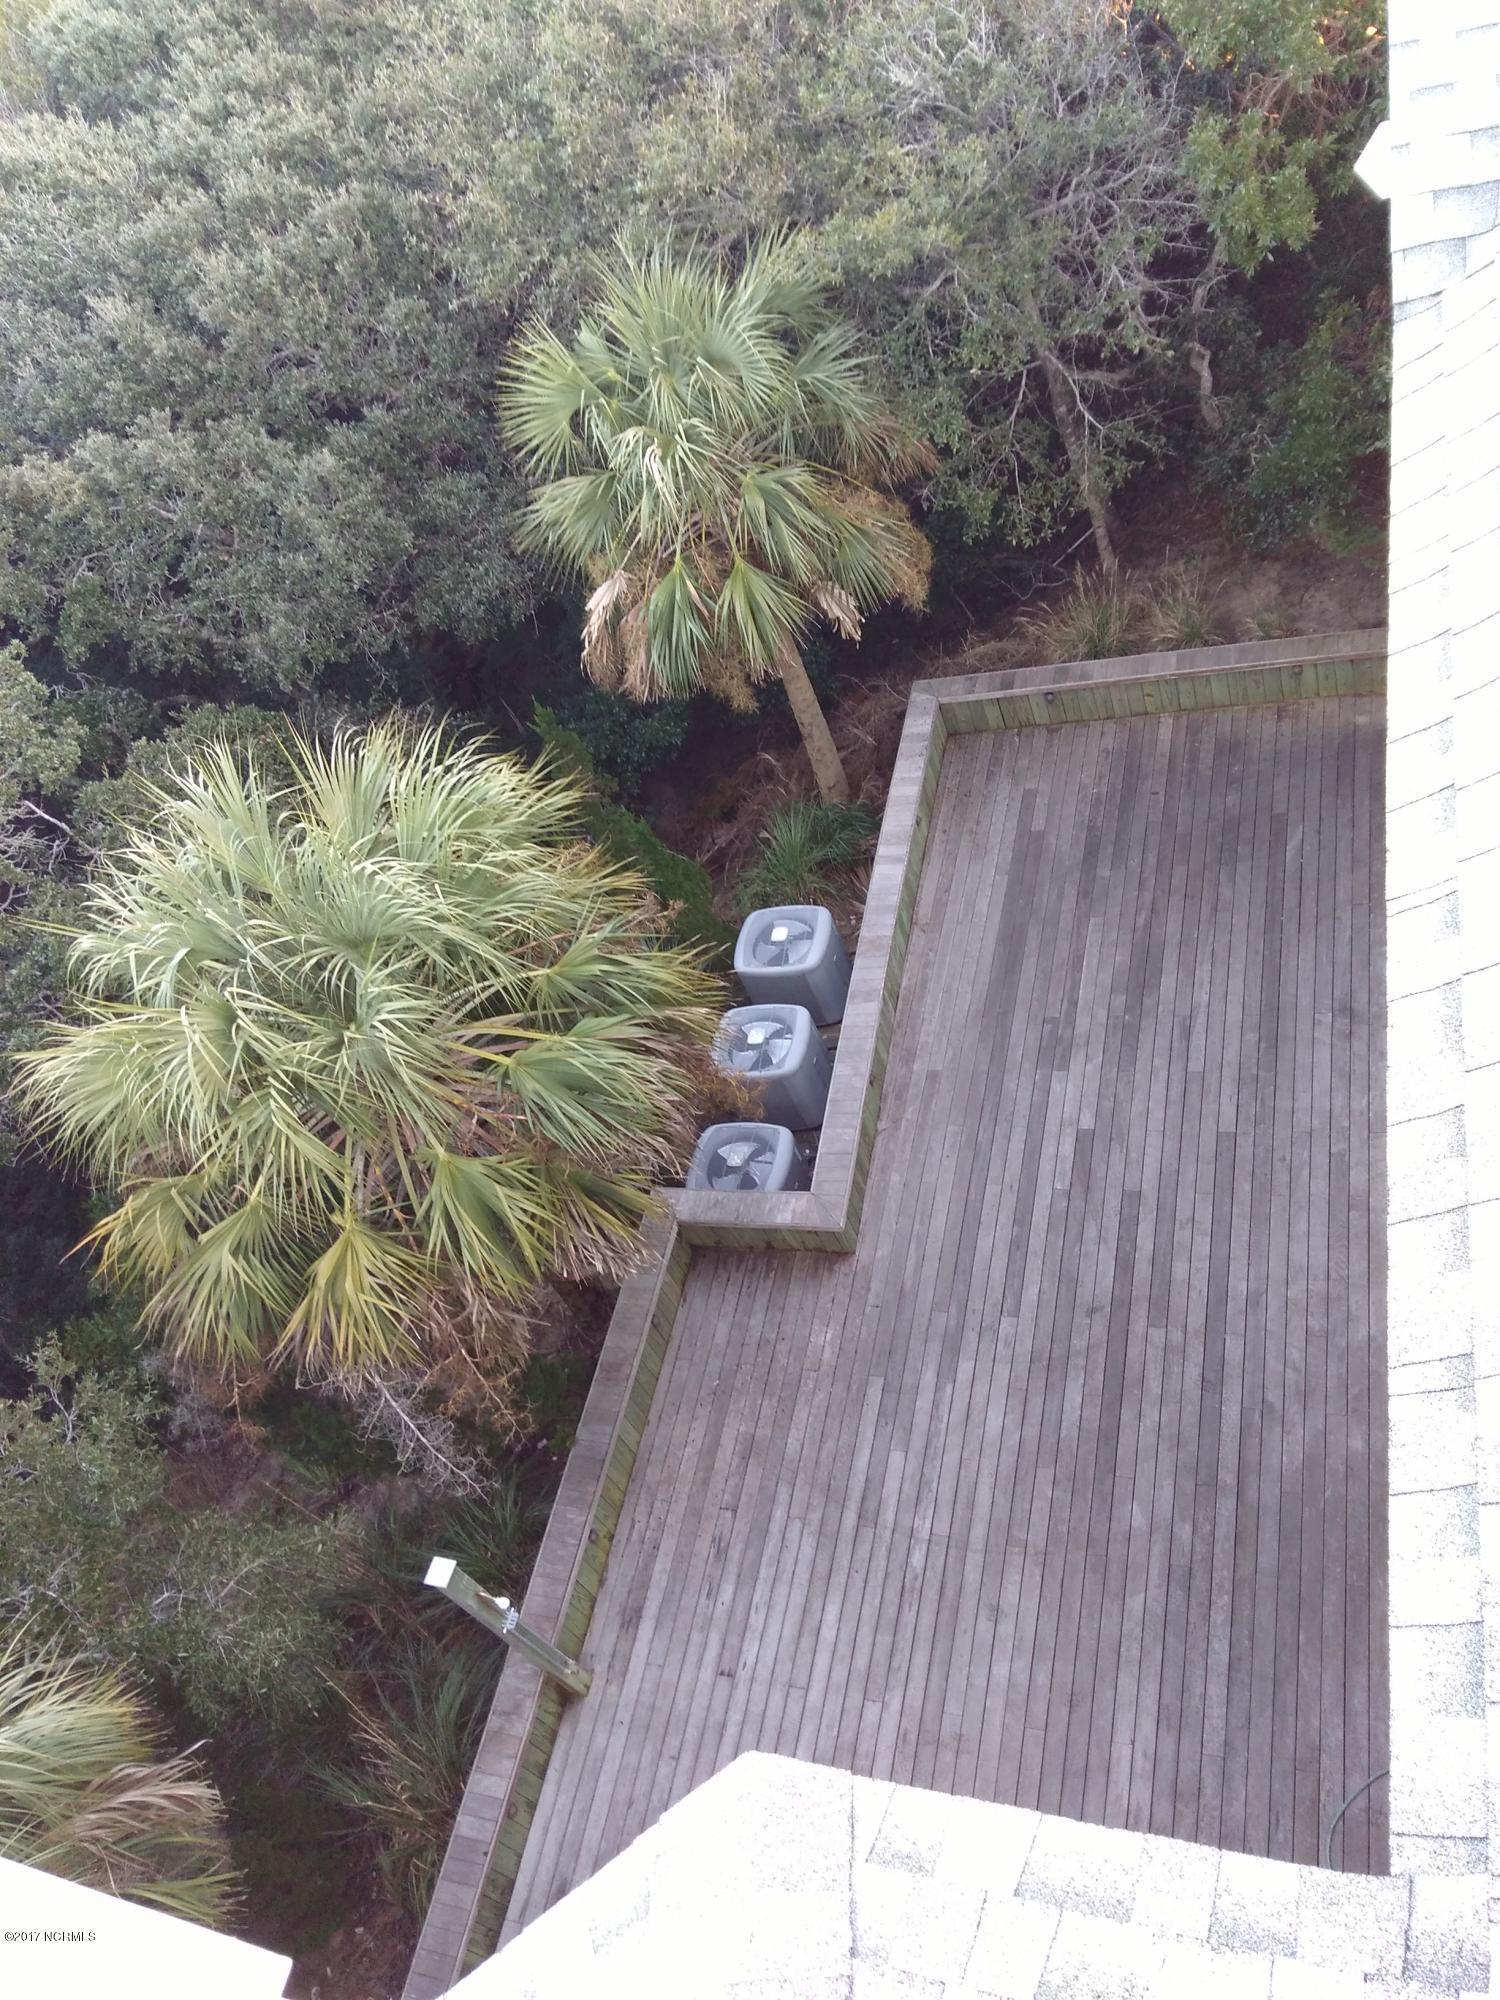 BHI (Bald Head Island) Real Estate - http://cdn.resize.sparkplatform.com/ncr/1024x768/true/20171213032248435128000000-o.jpg